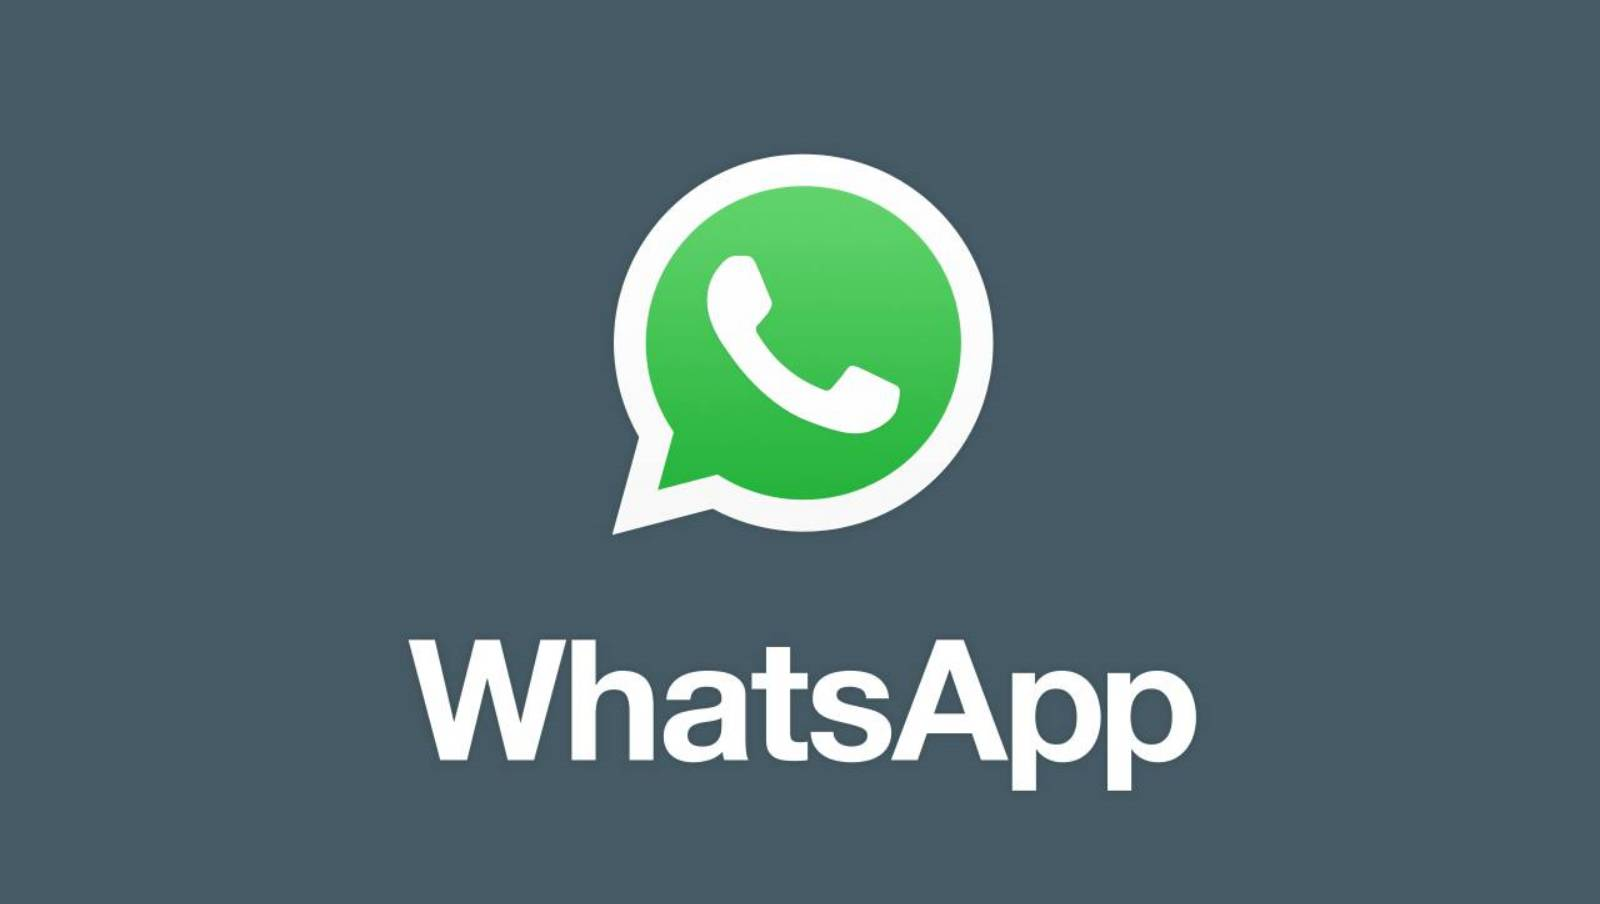 Marea PROBLEMA WhatsApp PLANGE LUME